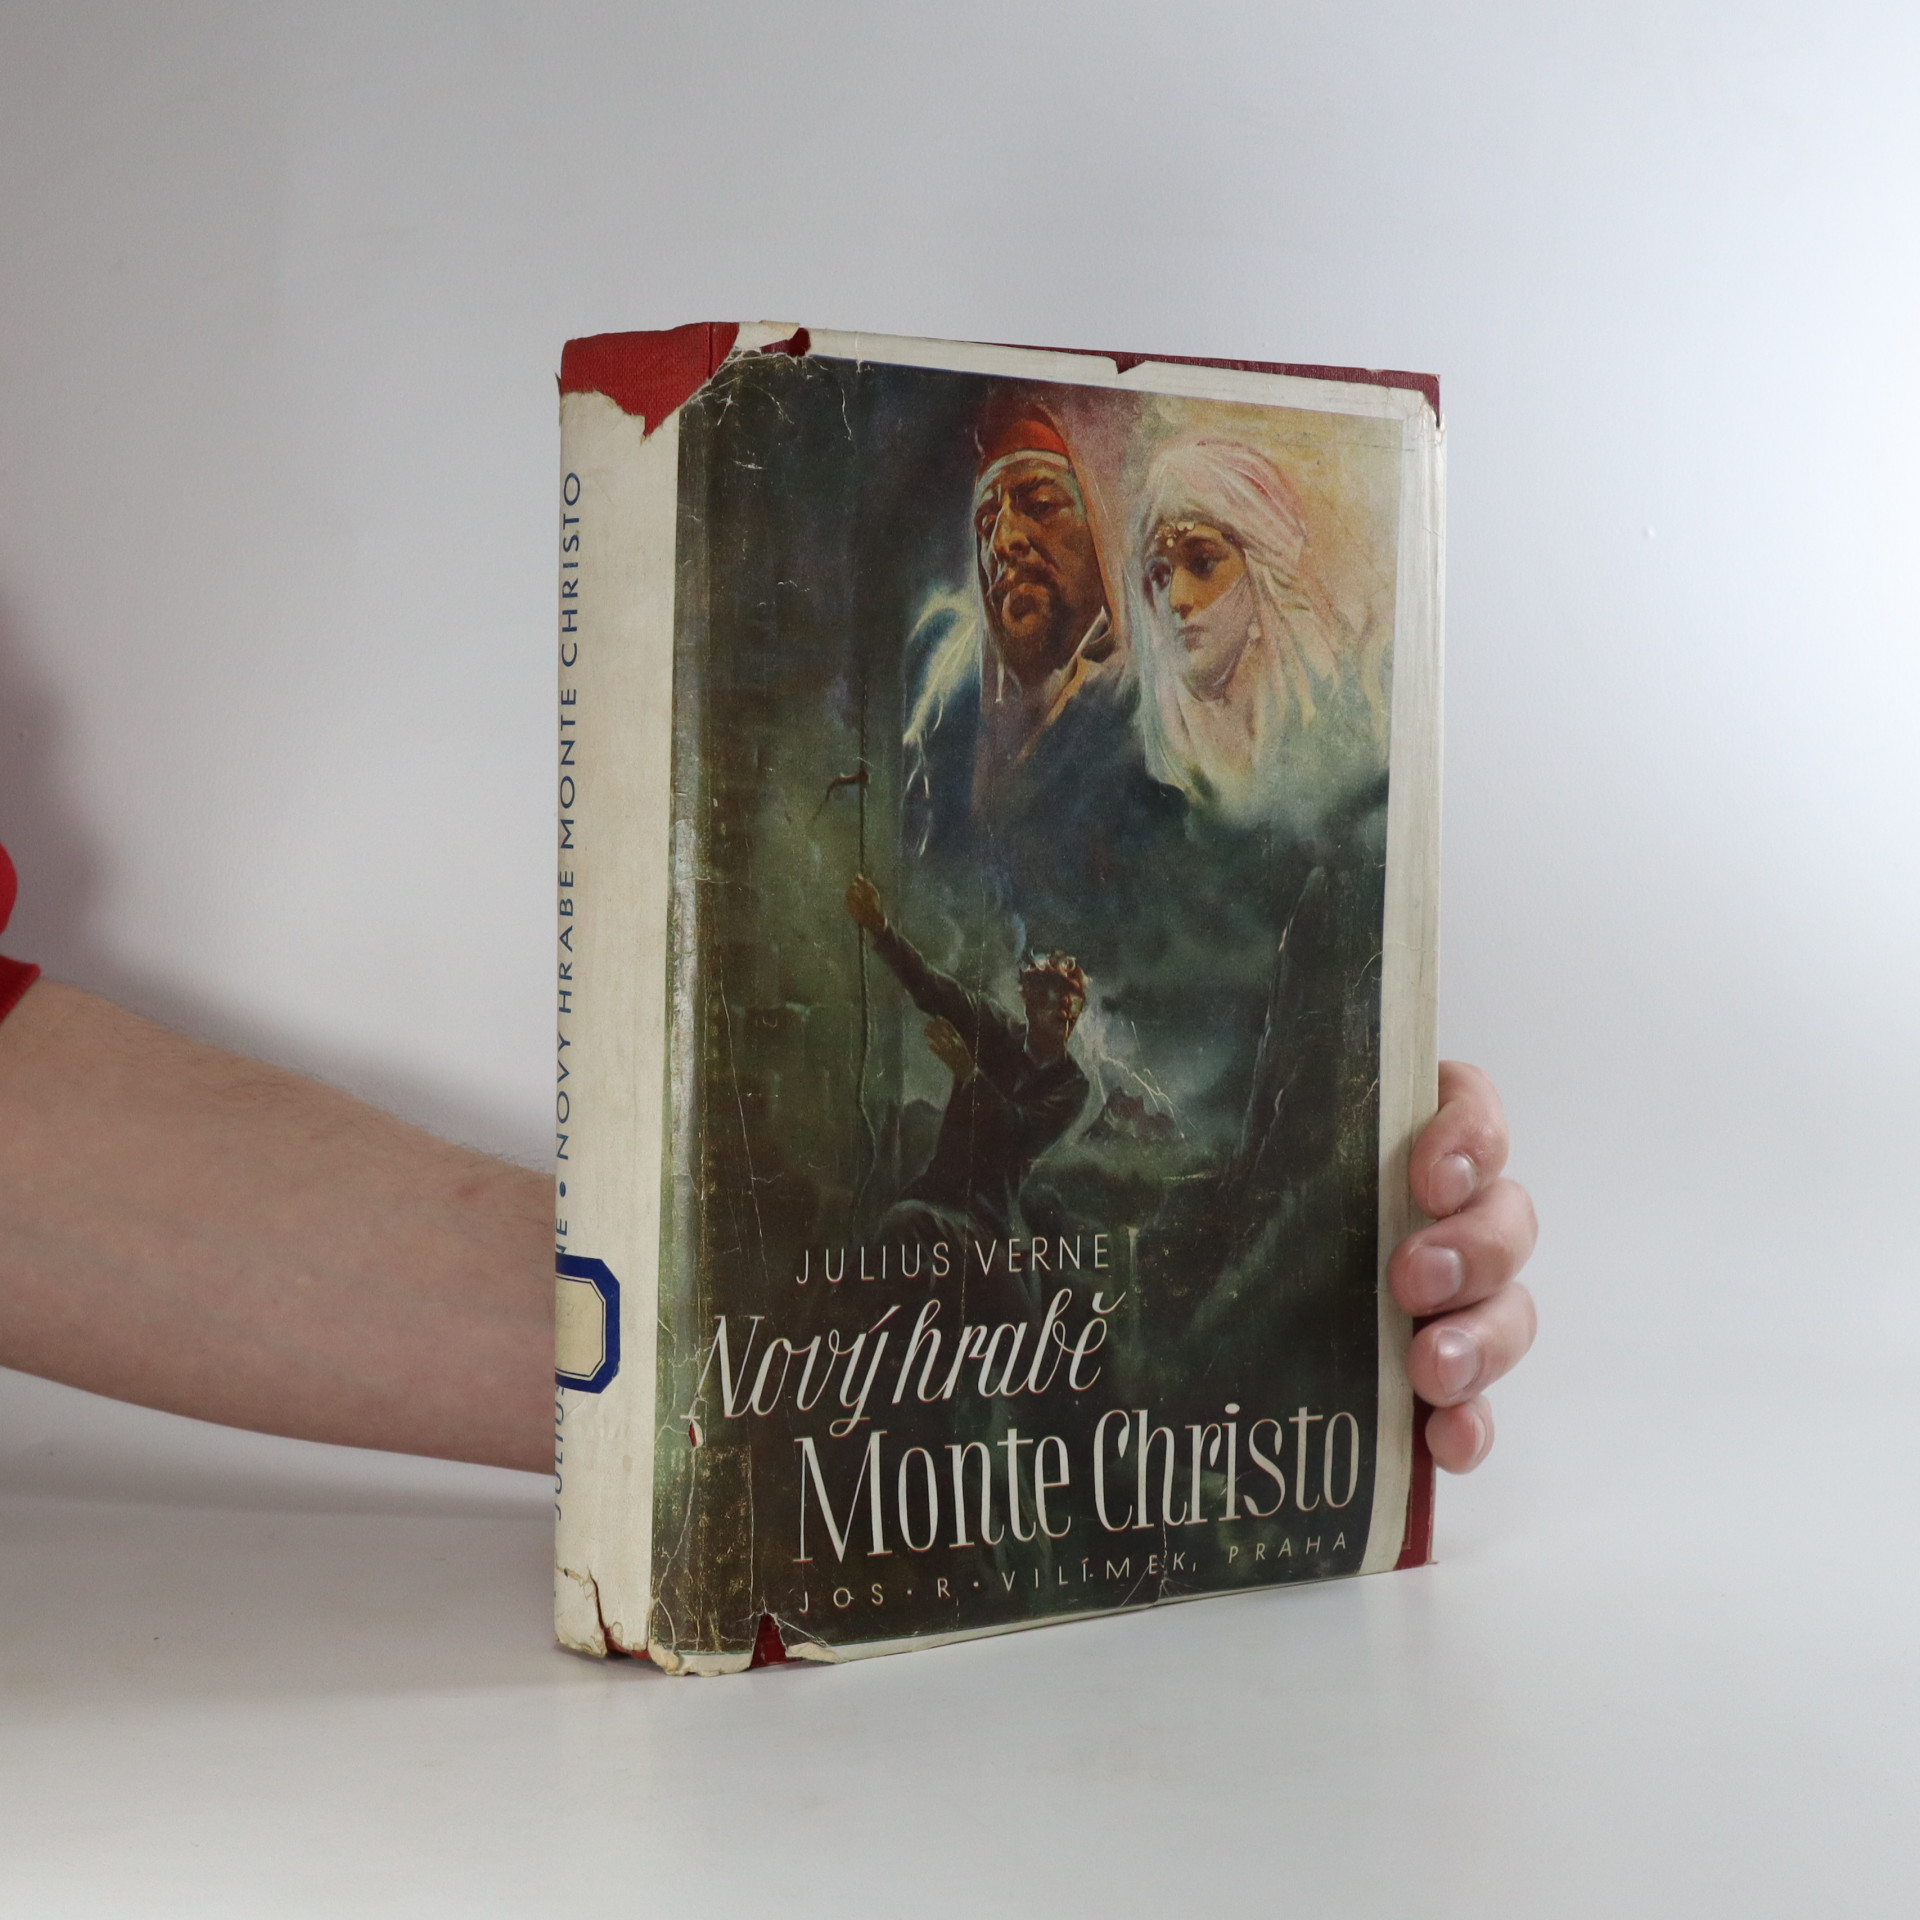 antikvární kniha Nový hrabě Monte Christo (potrhaný přebal), 1941